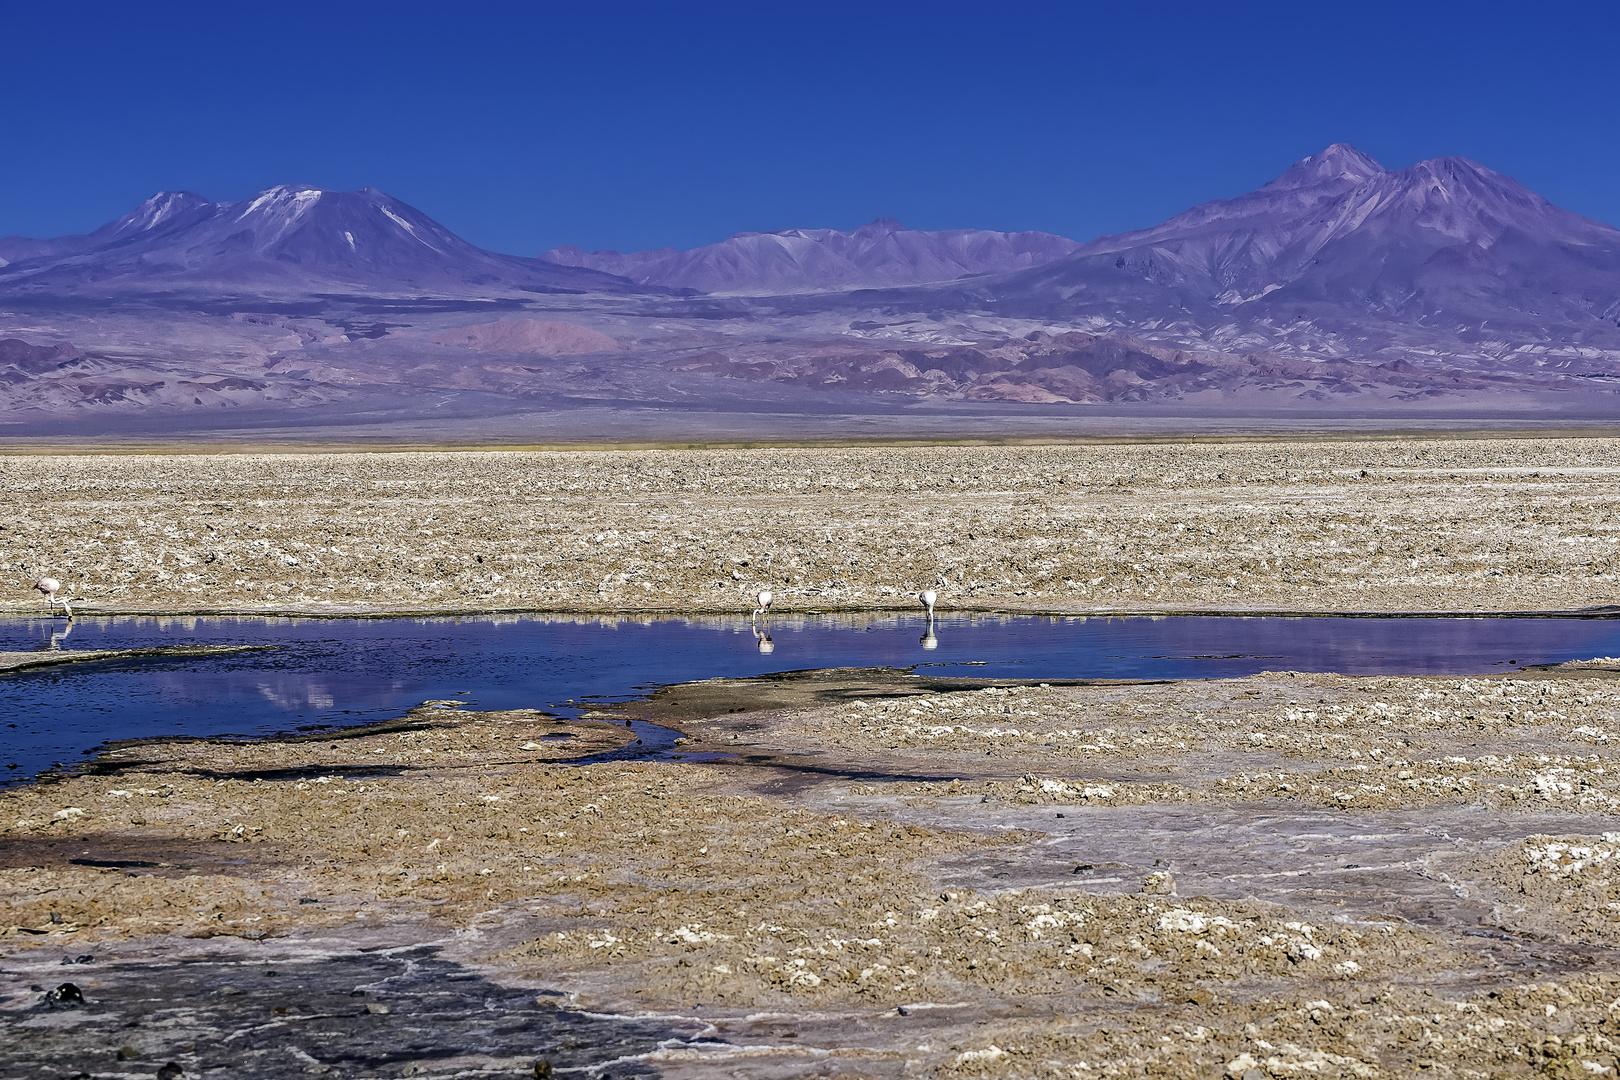 Flamingos in einer Lagune mitten im Salar de Atacama